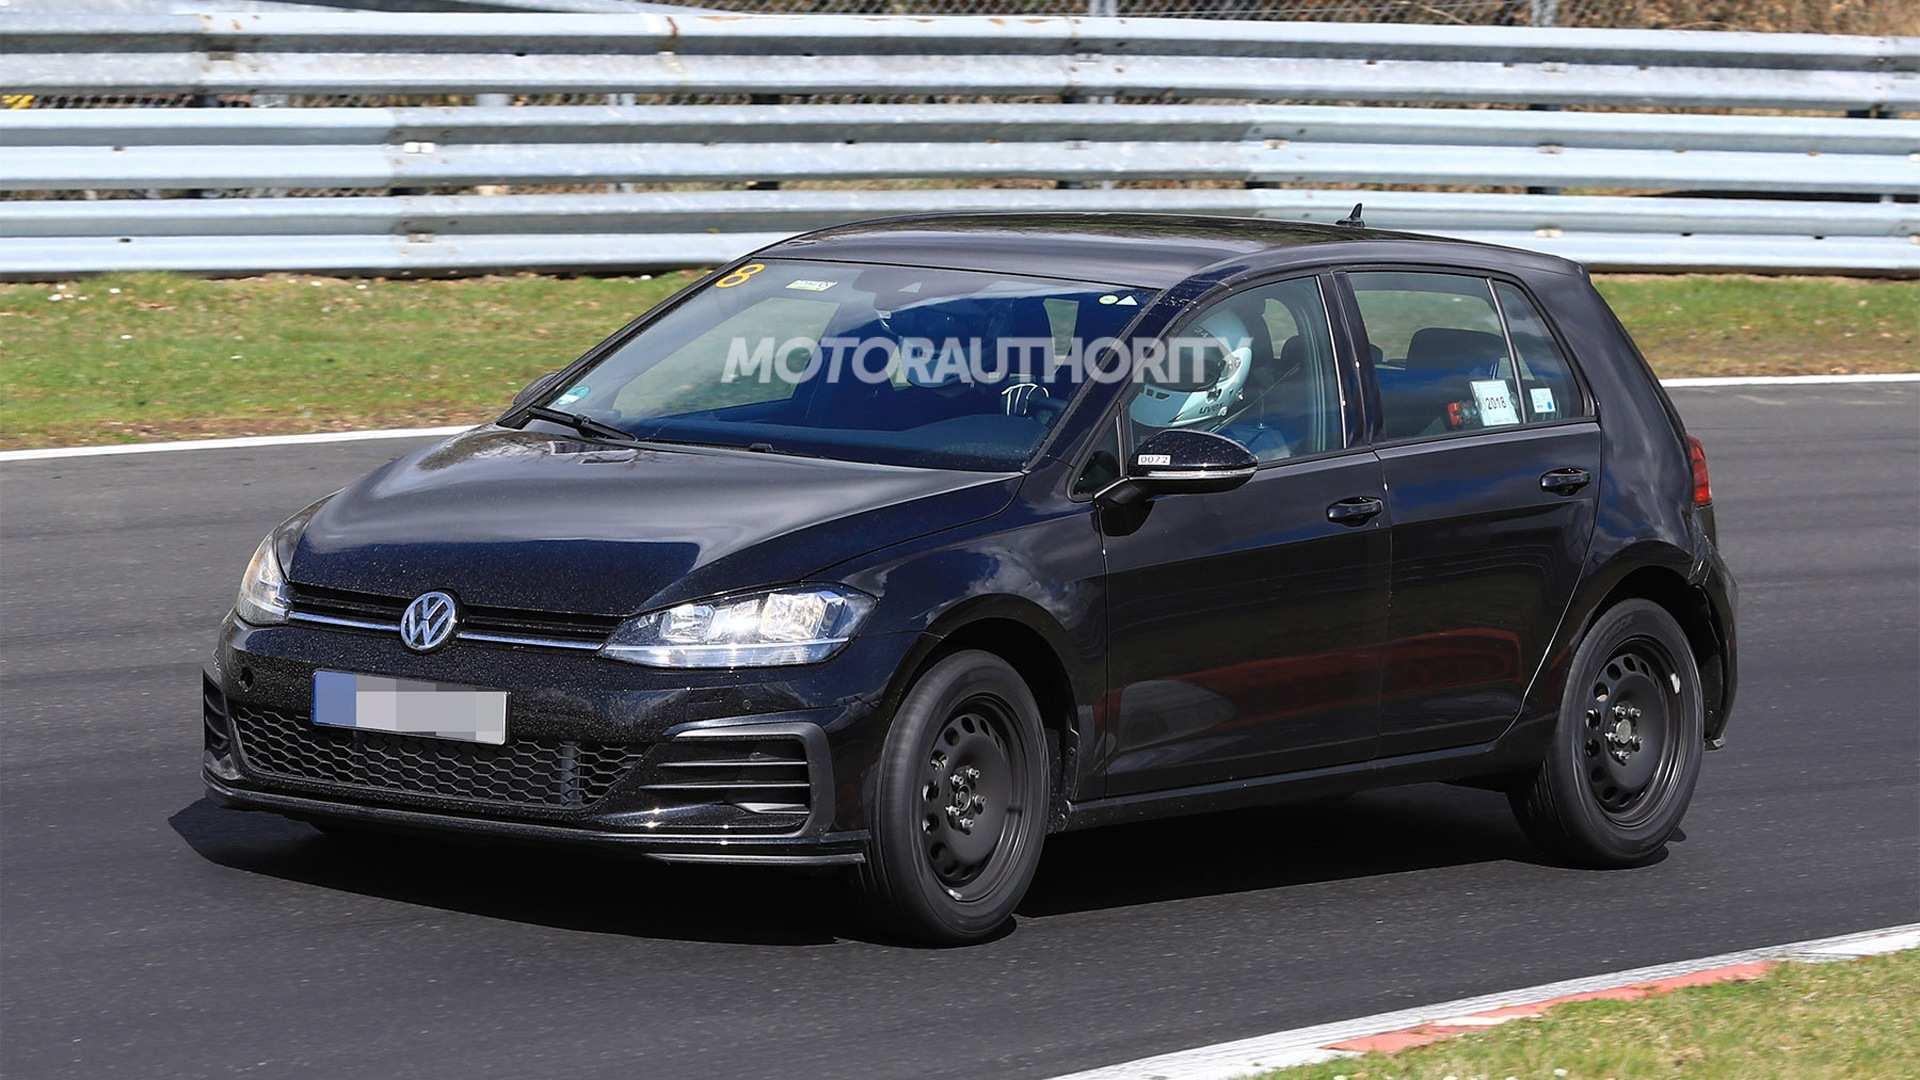 62 Gallery of 2020 Volkswagen Golf R Reviews with 2020 Volkswagen Golf R